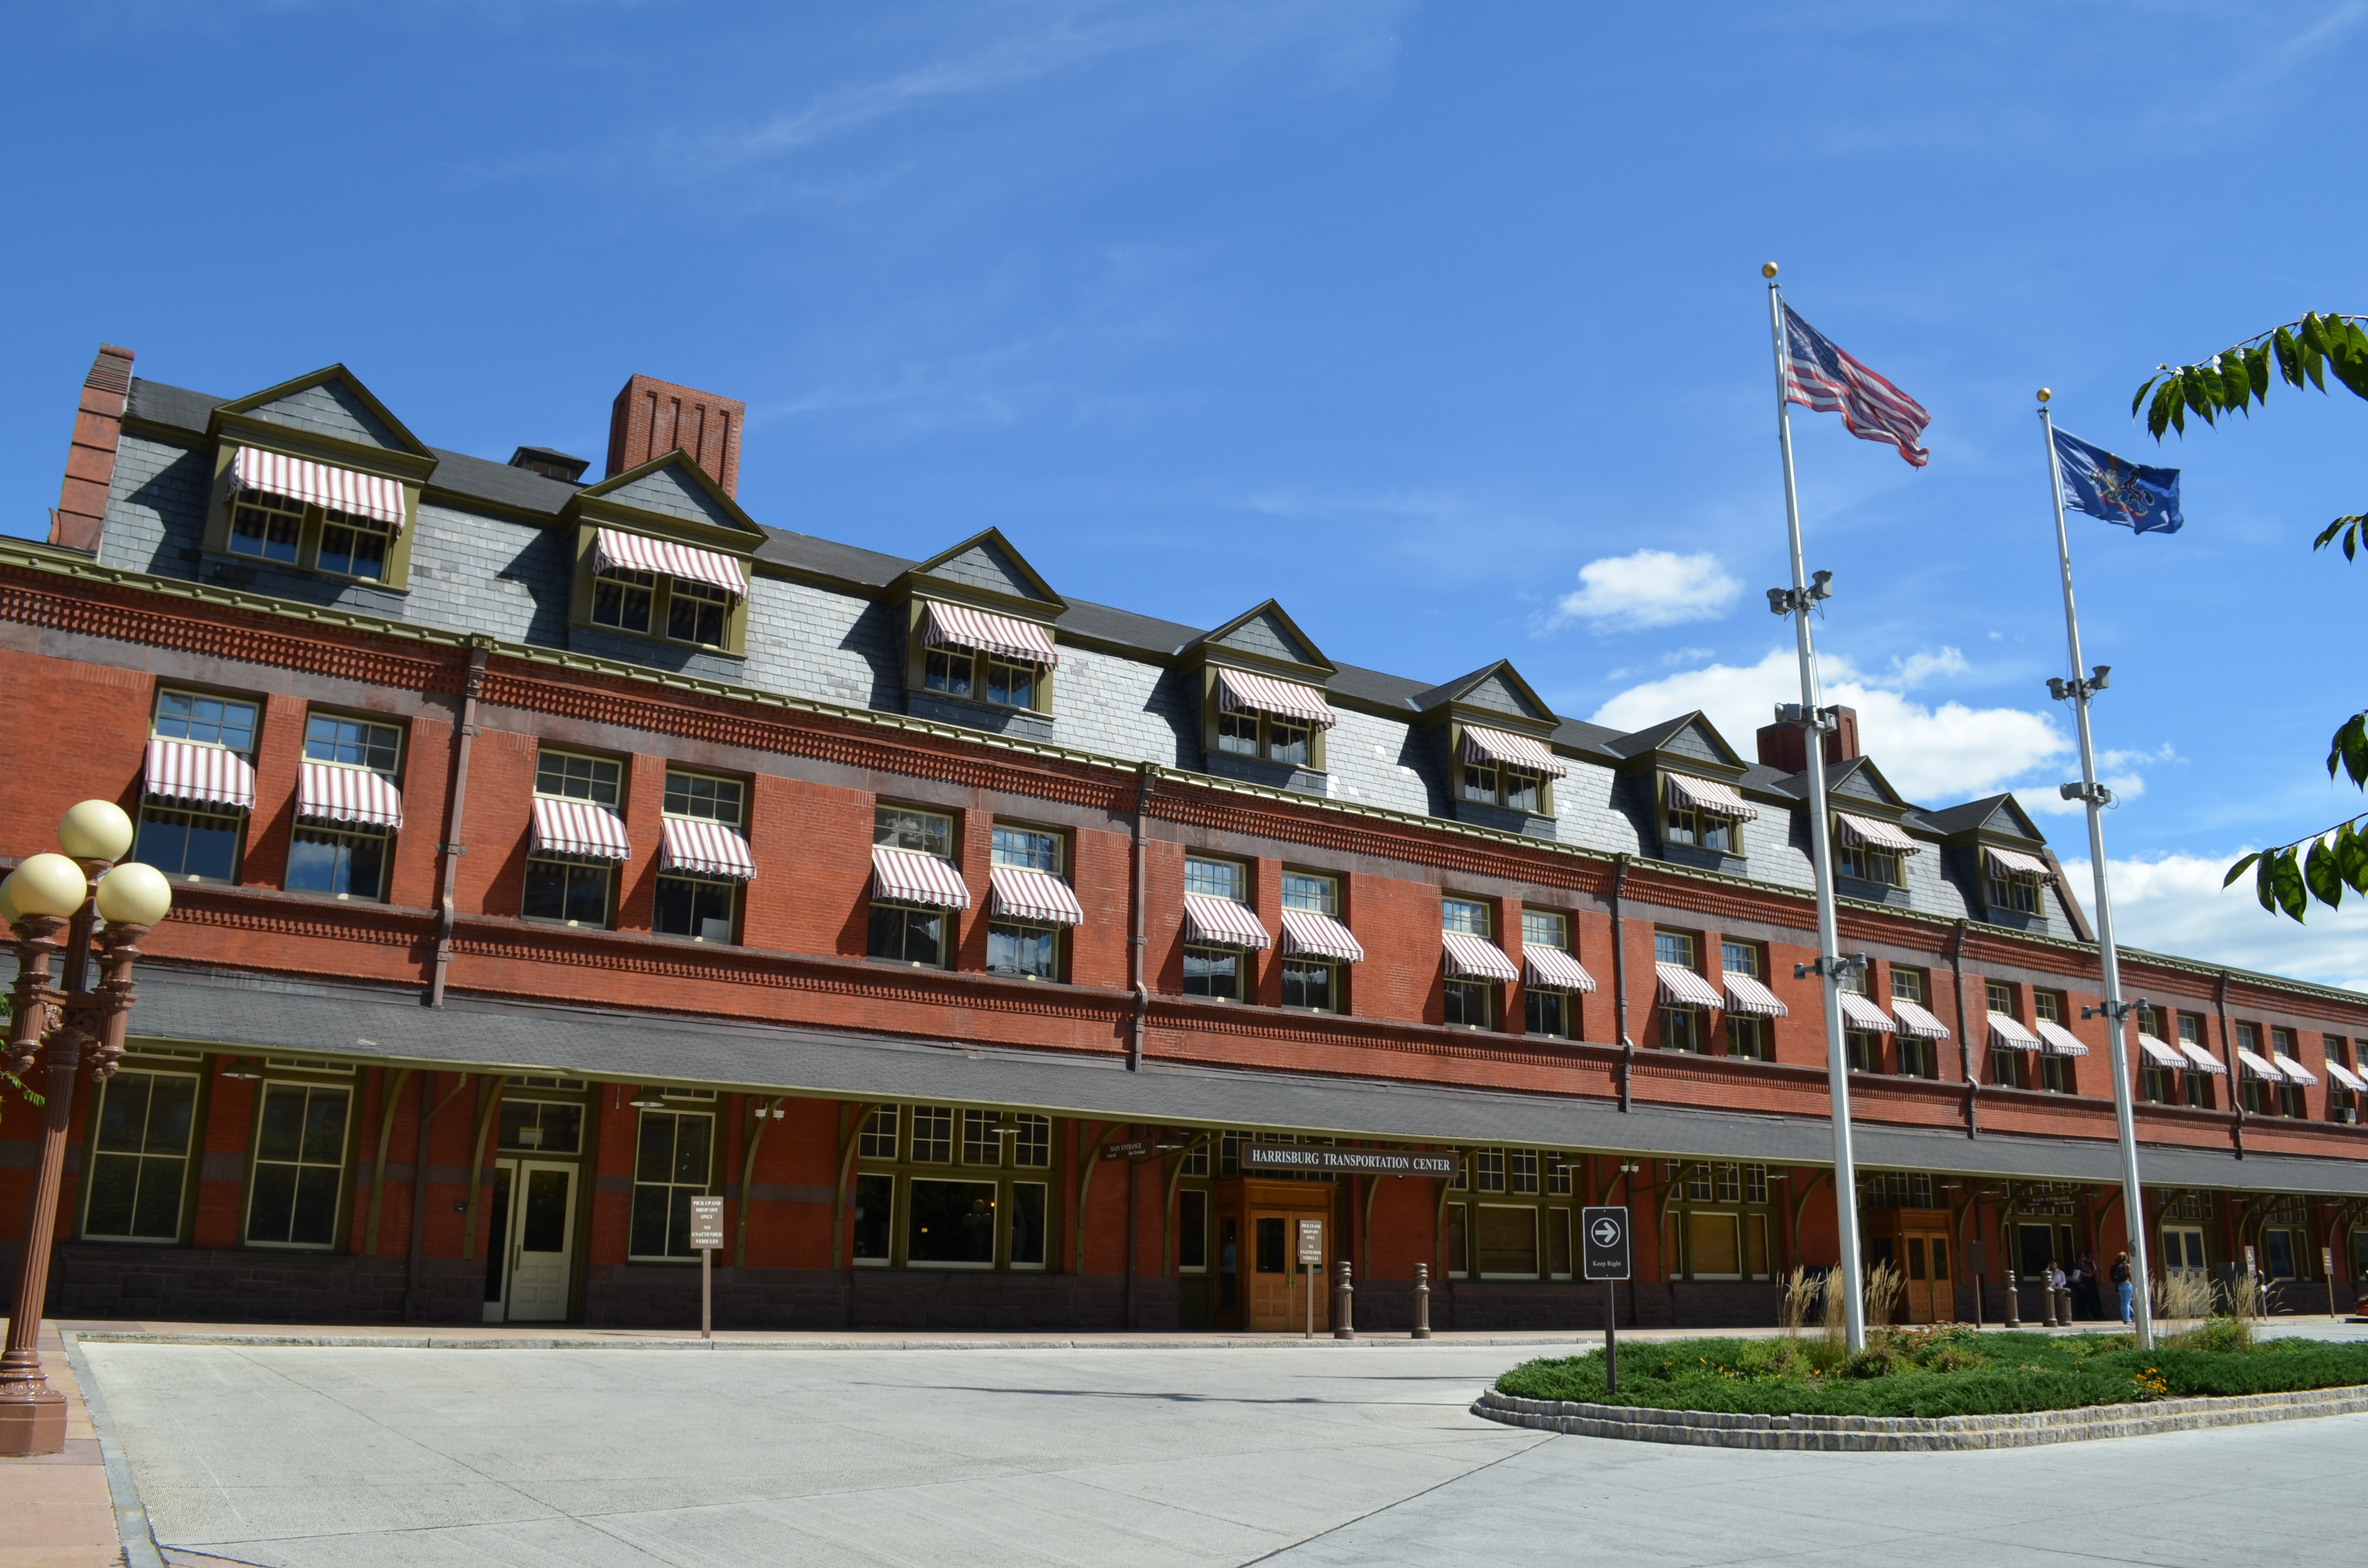 Harrisburg Transportation Center - Wikipedia